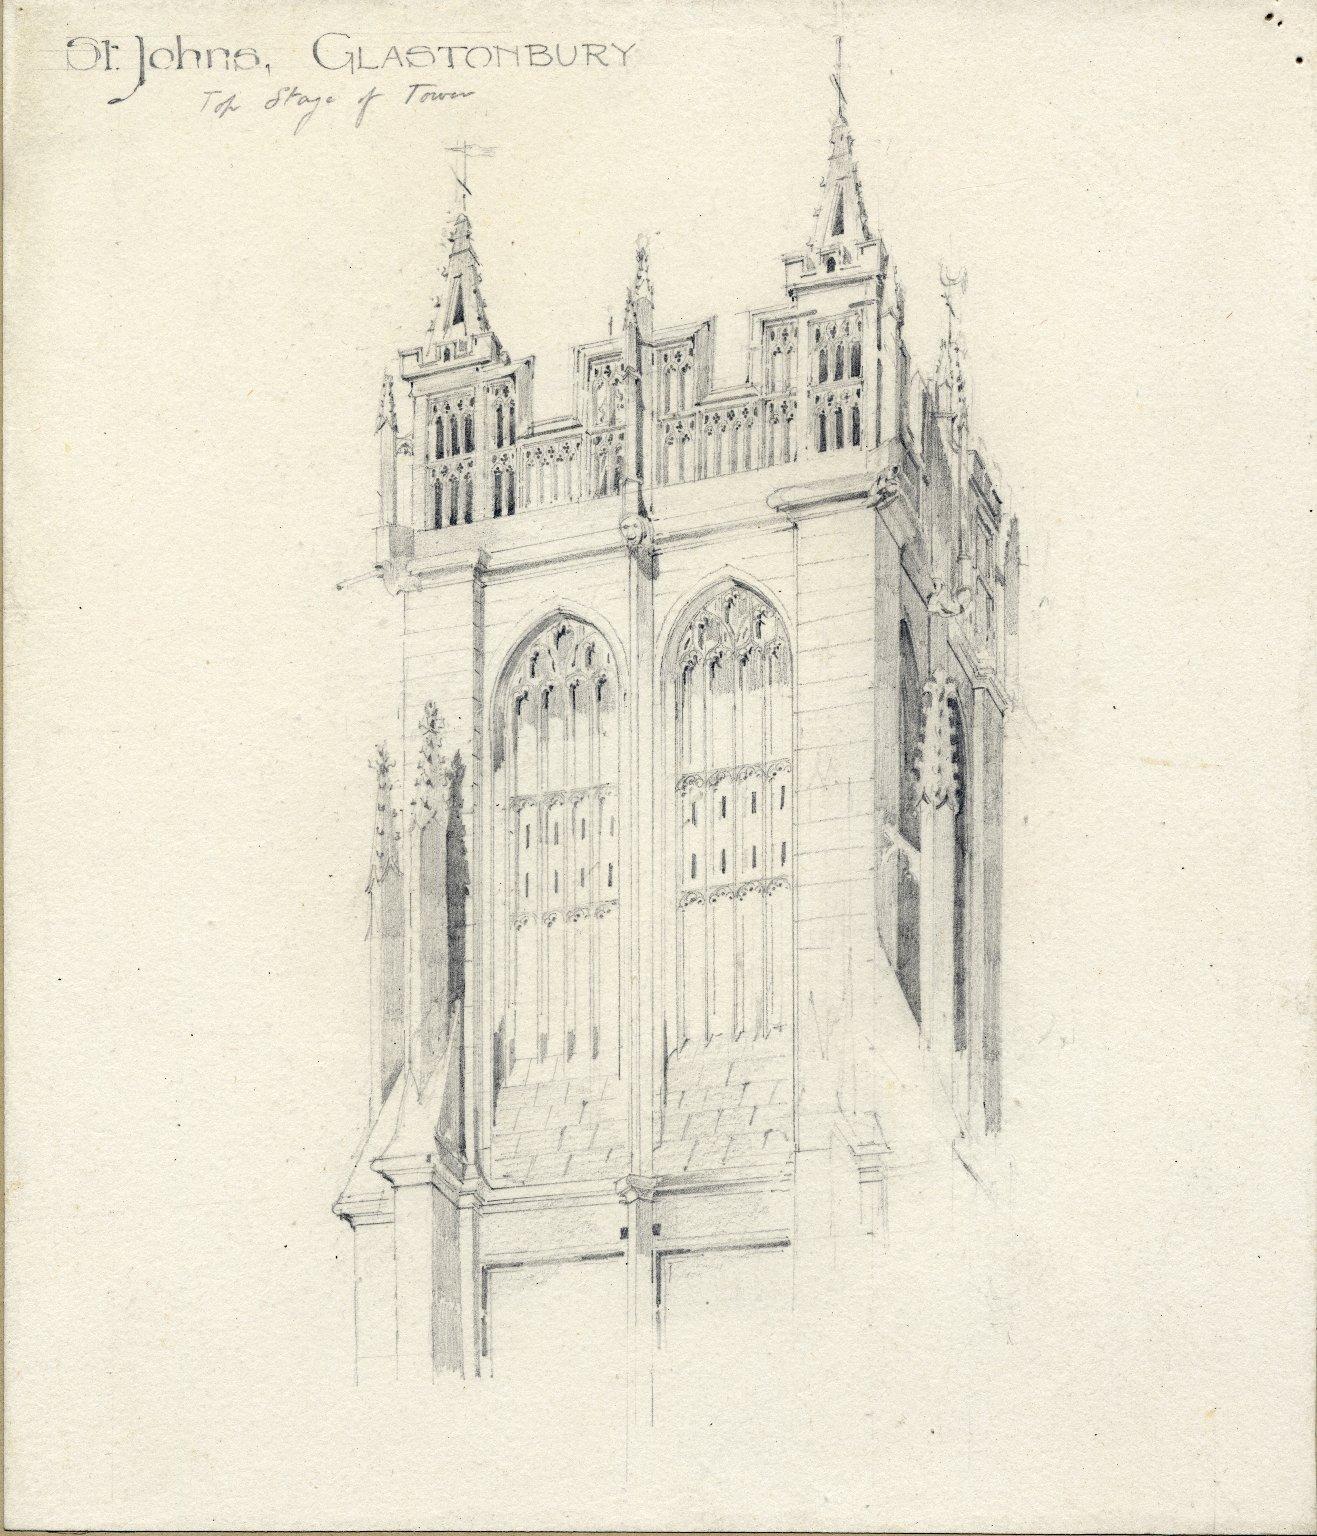 Top of tower at St. John's, Glastonbury